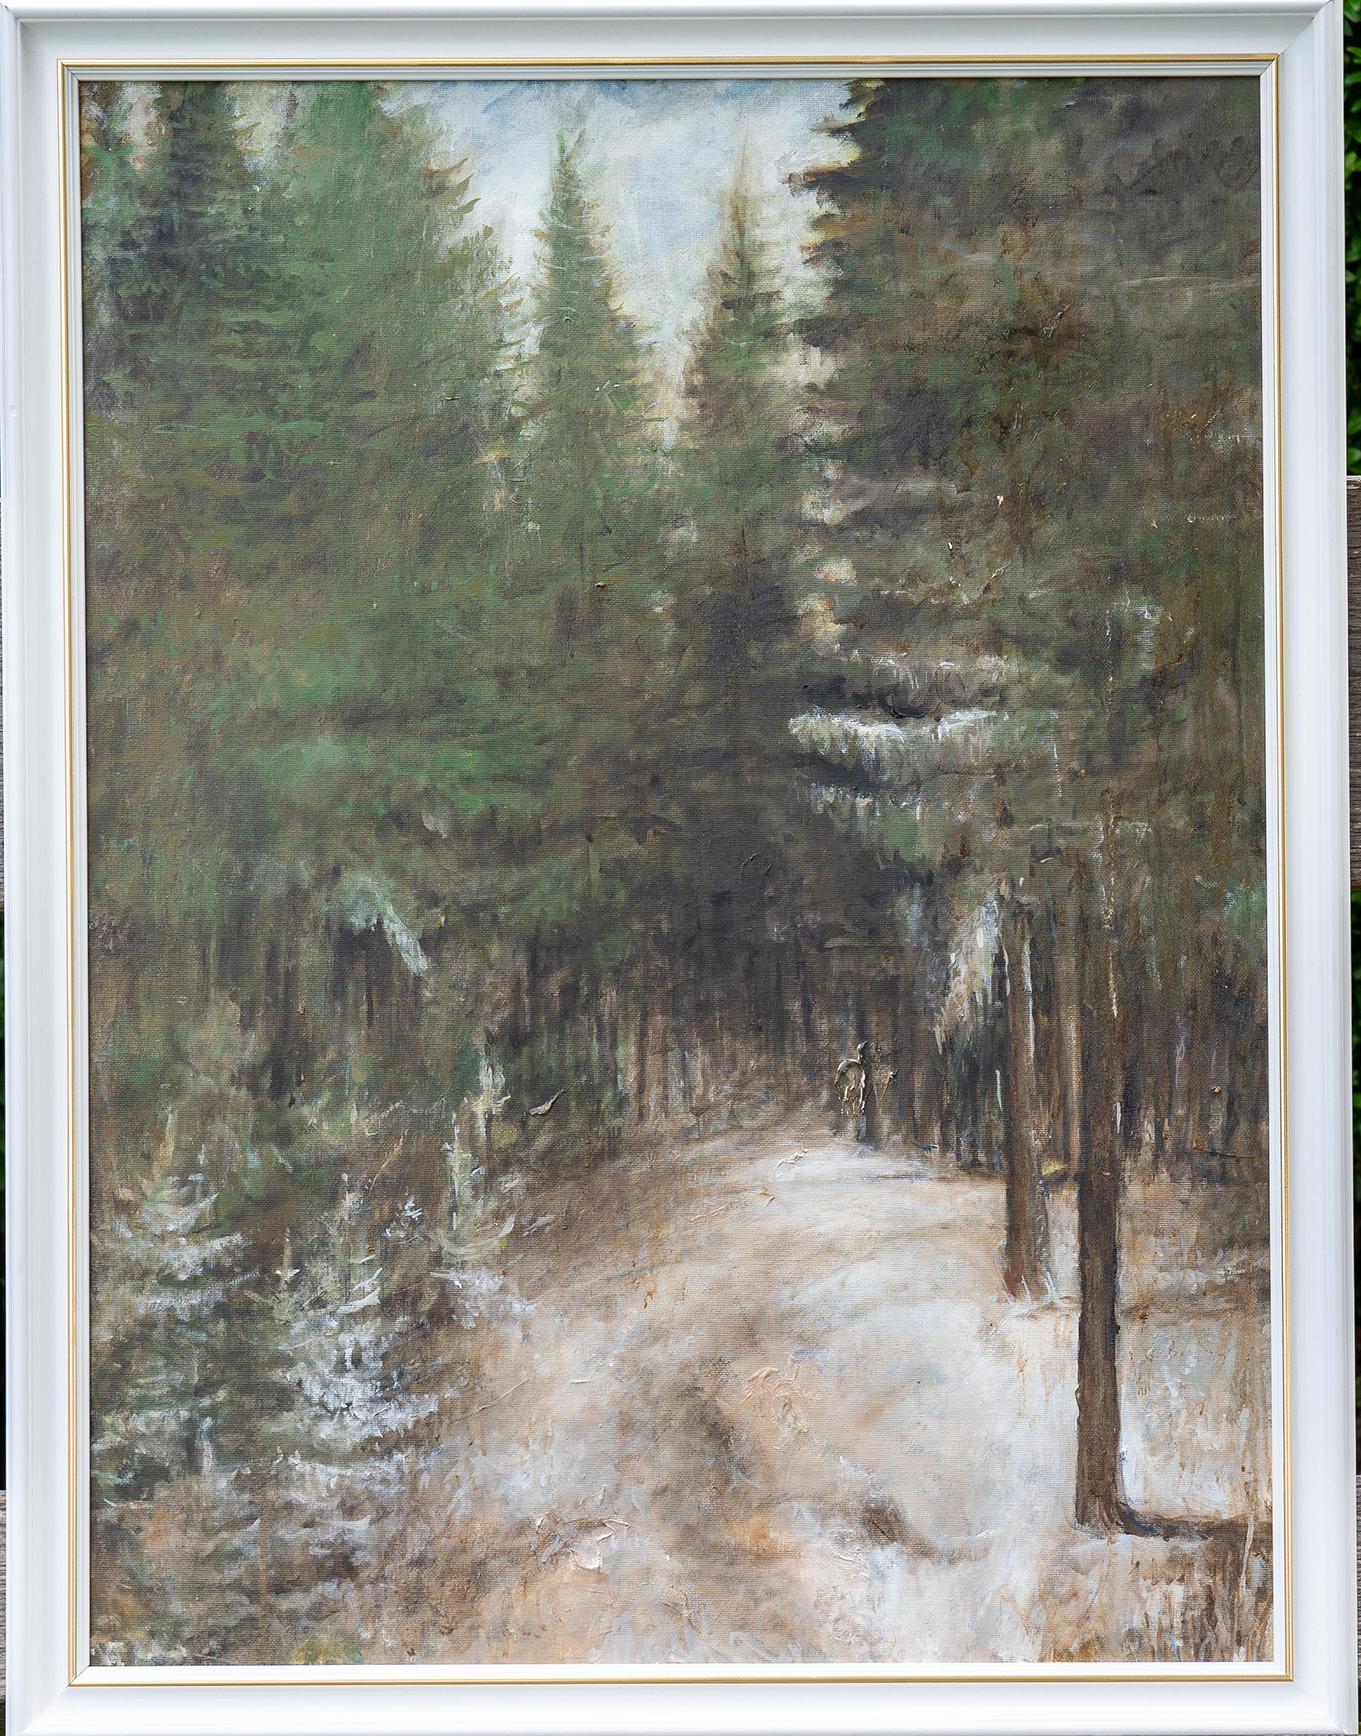 Wald, du moosiger Träumer! Gedichte, Peter Hille,  19. Jahrhundert